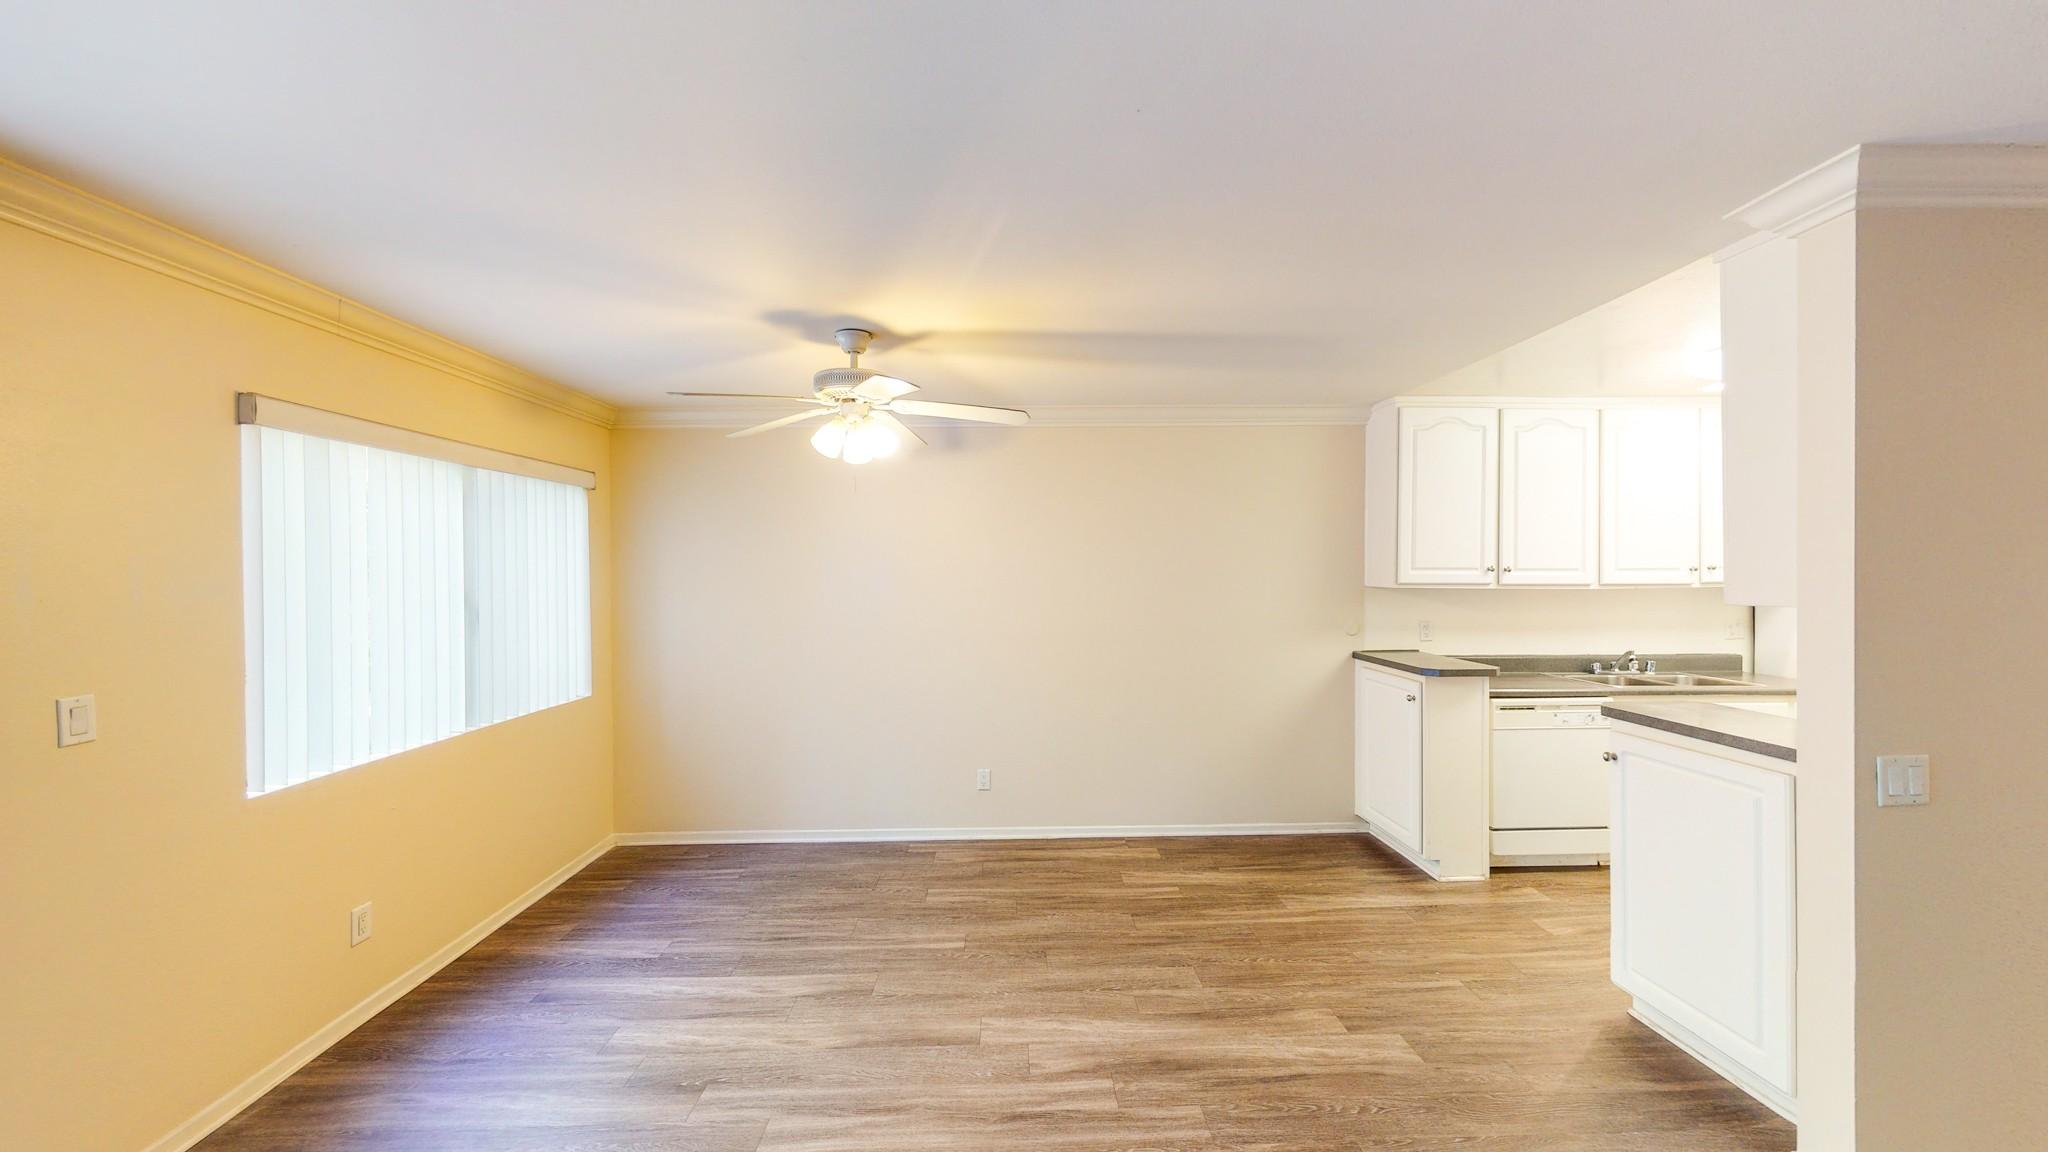 Los Feliz Summit Apartments for rent